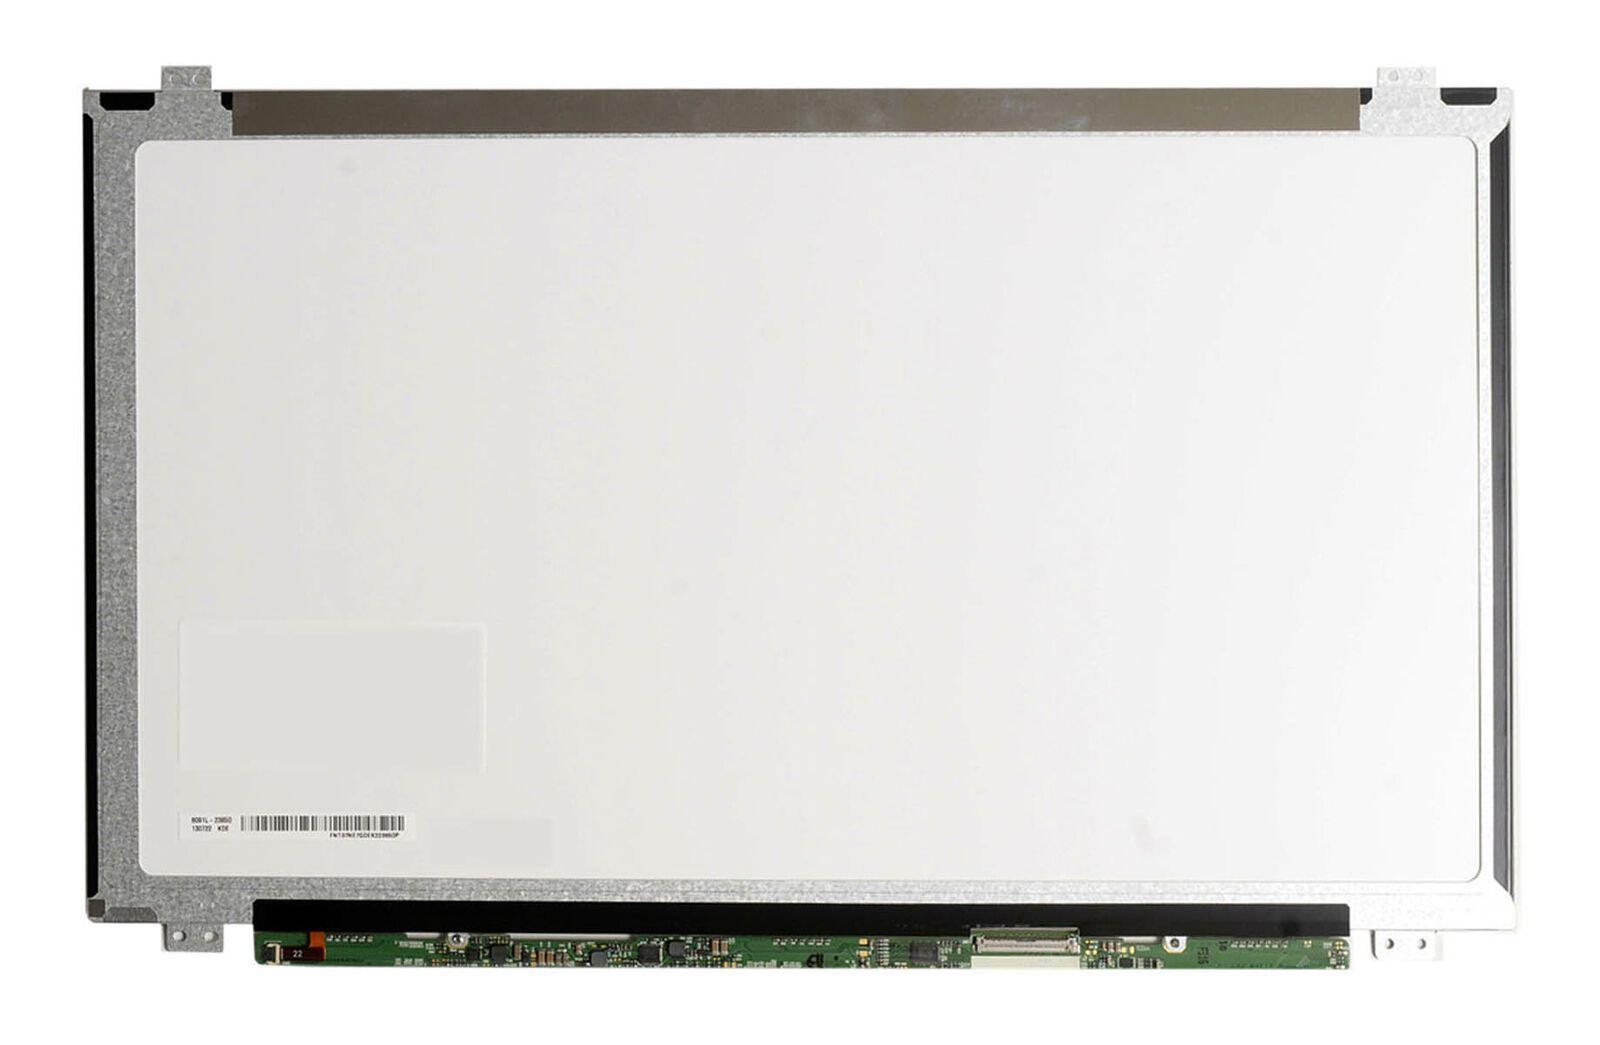 Tela 15.6 Led Slim Para Toshiba Satellite L55-a5299 1366x768 40 pin - EASY HELP NOTE